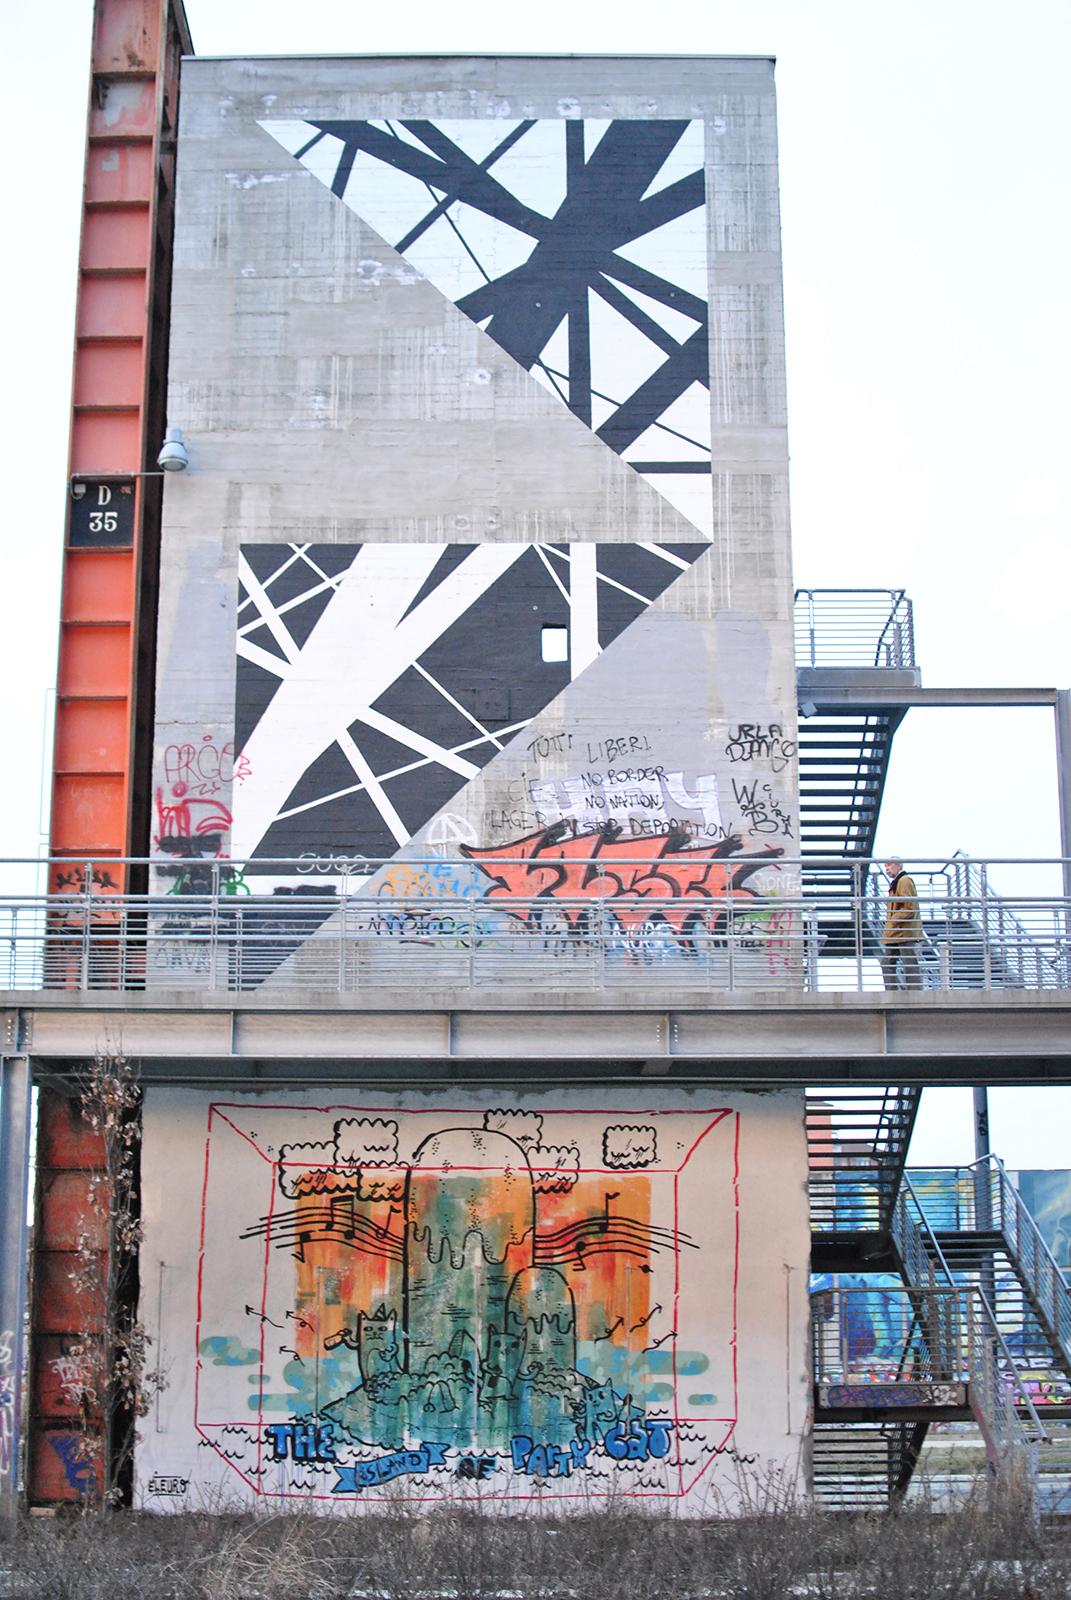 el-euro-new-mural-at-parco-dora-torino-04